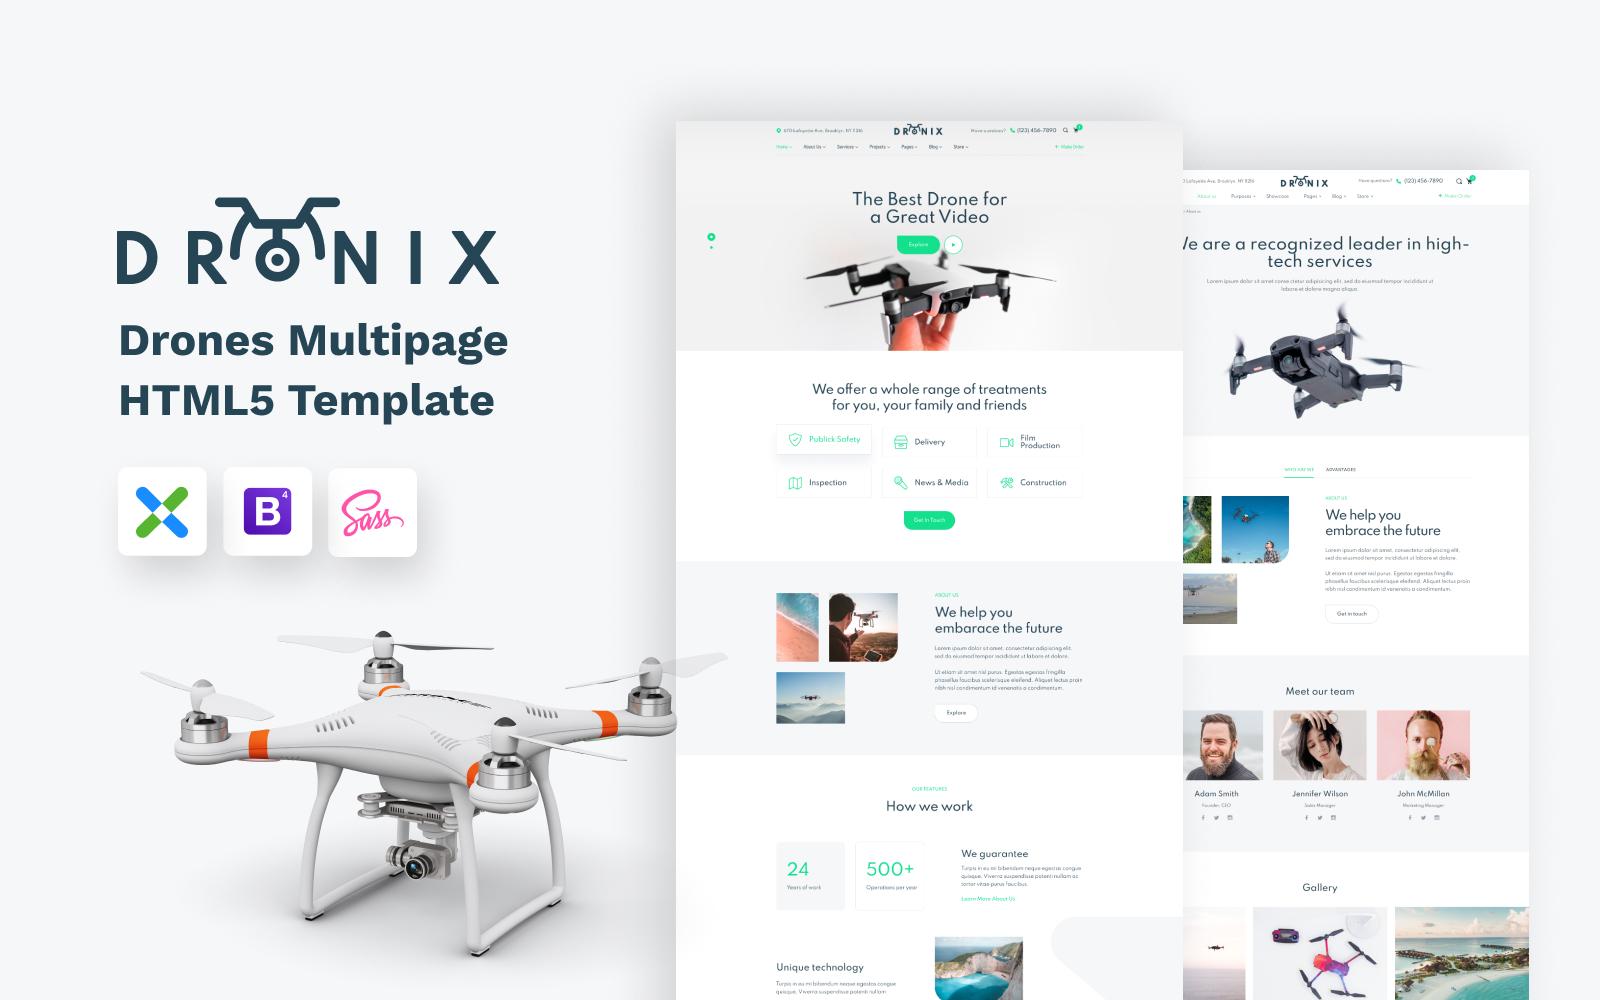 Dronix-无人机商店网站模板